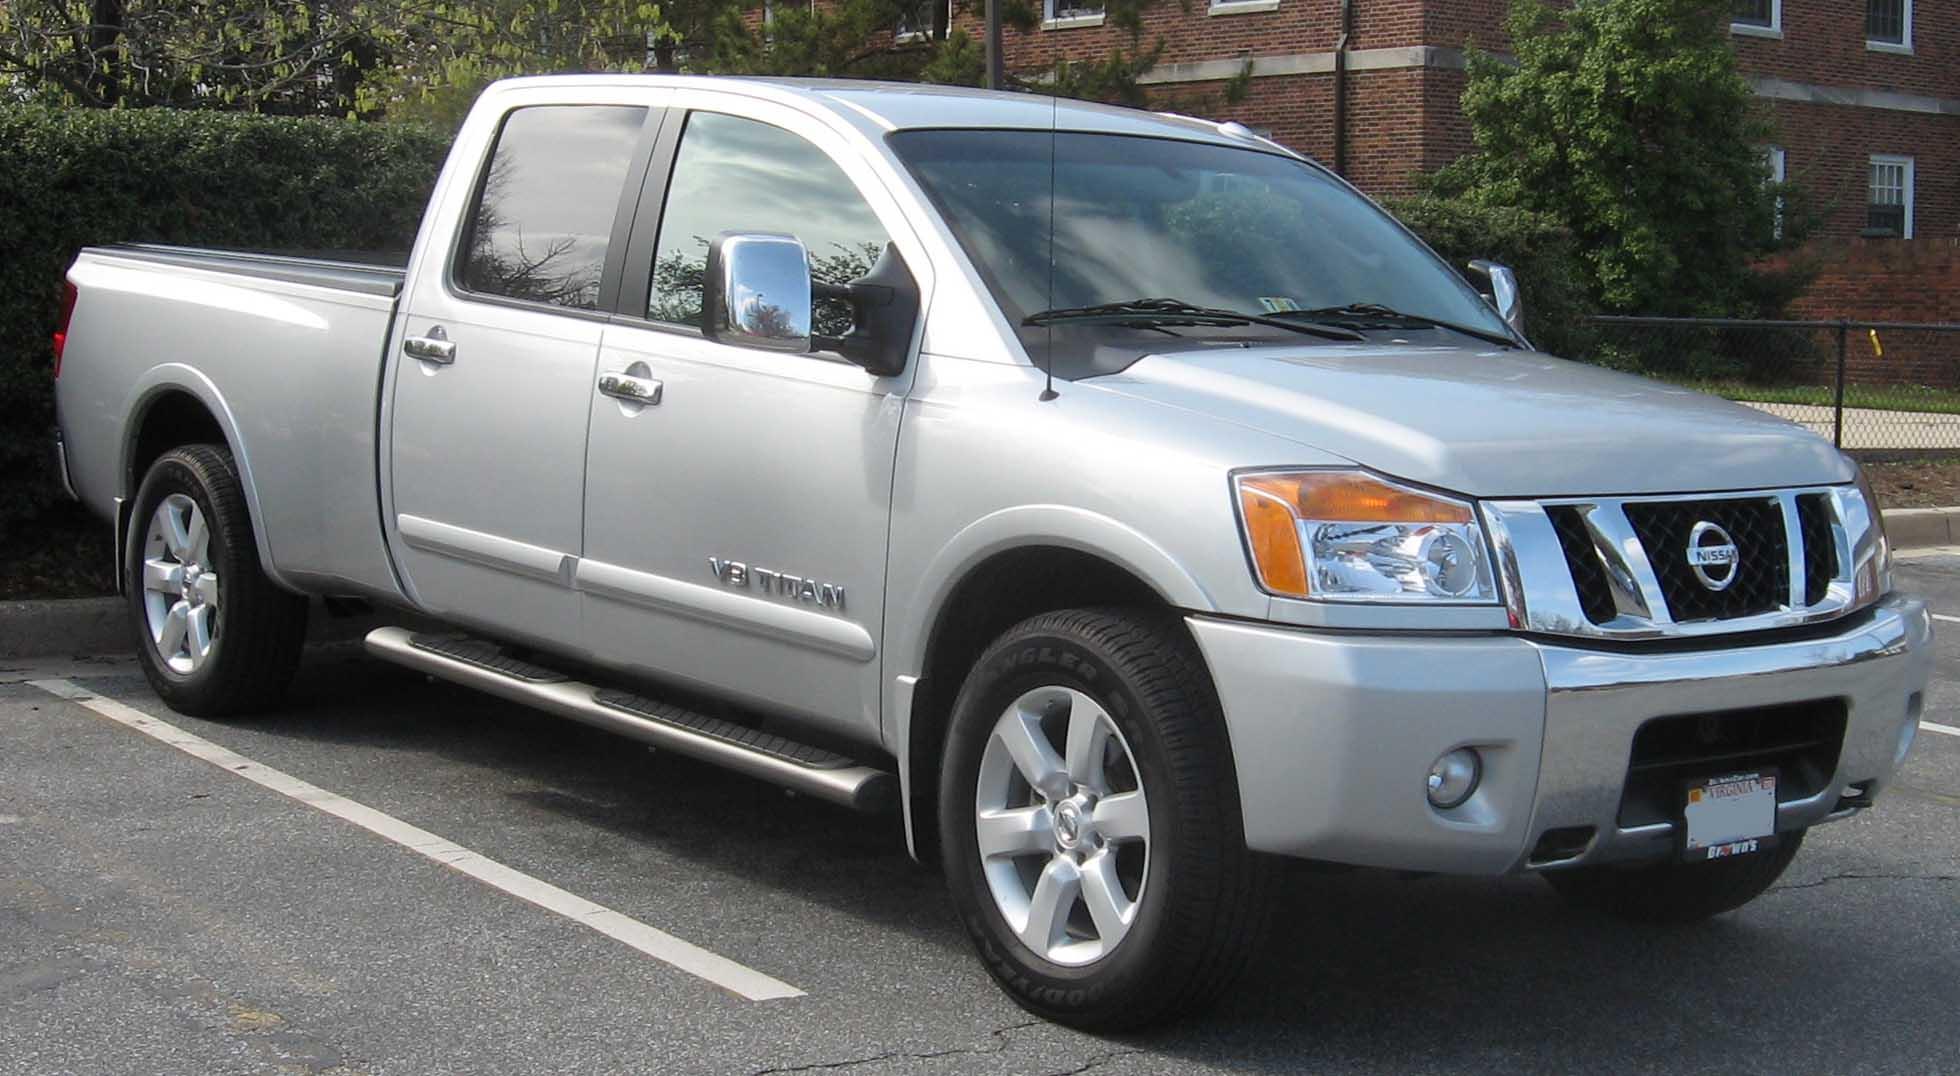 Nissan Pathfinder Bed Size